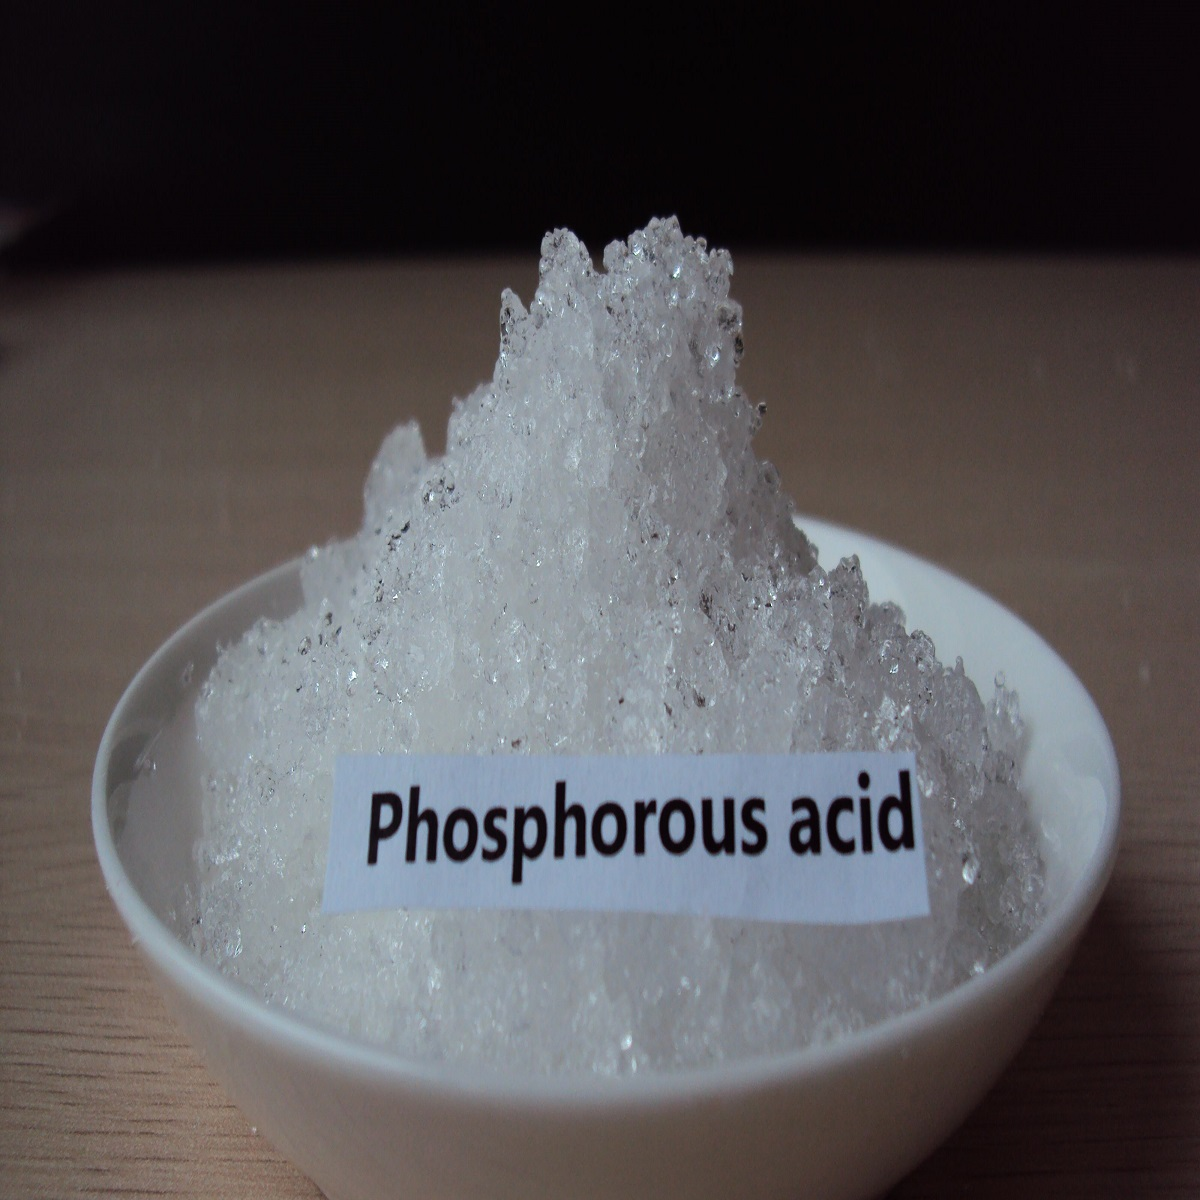 Phosphorous acid with best price and quality